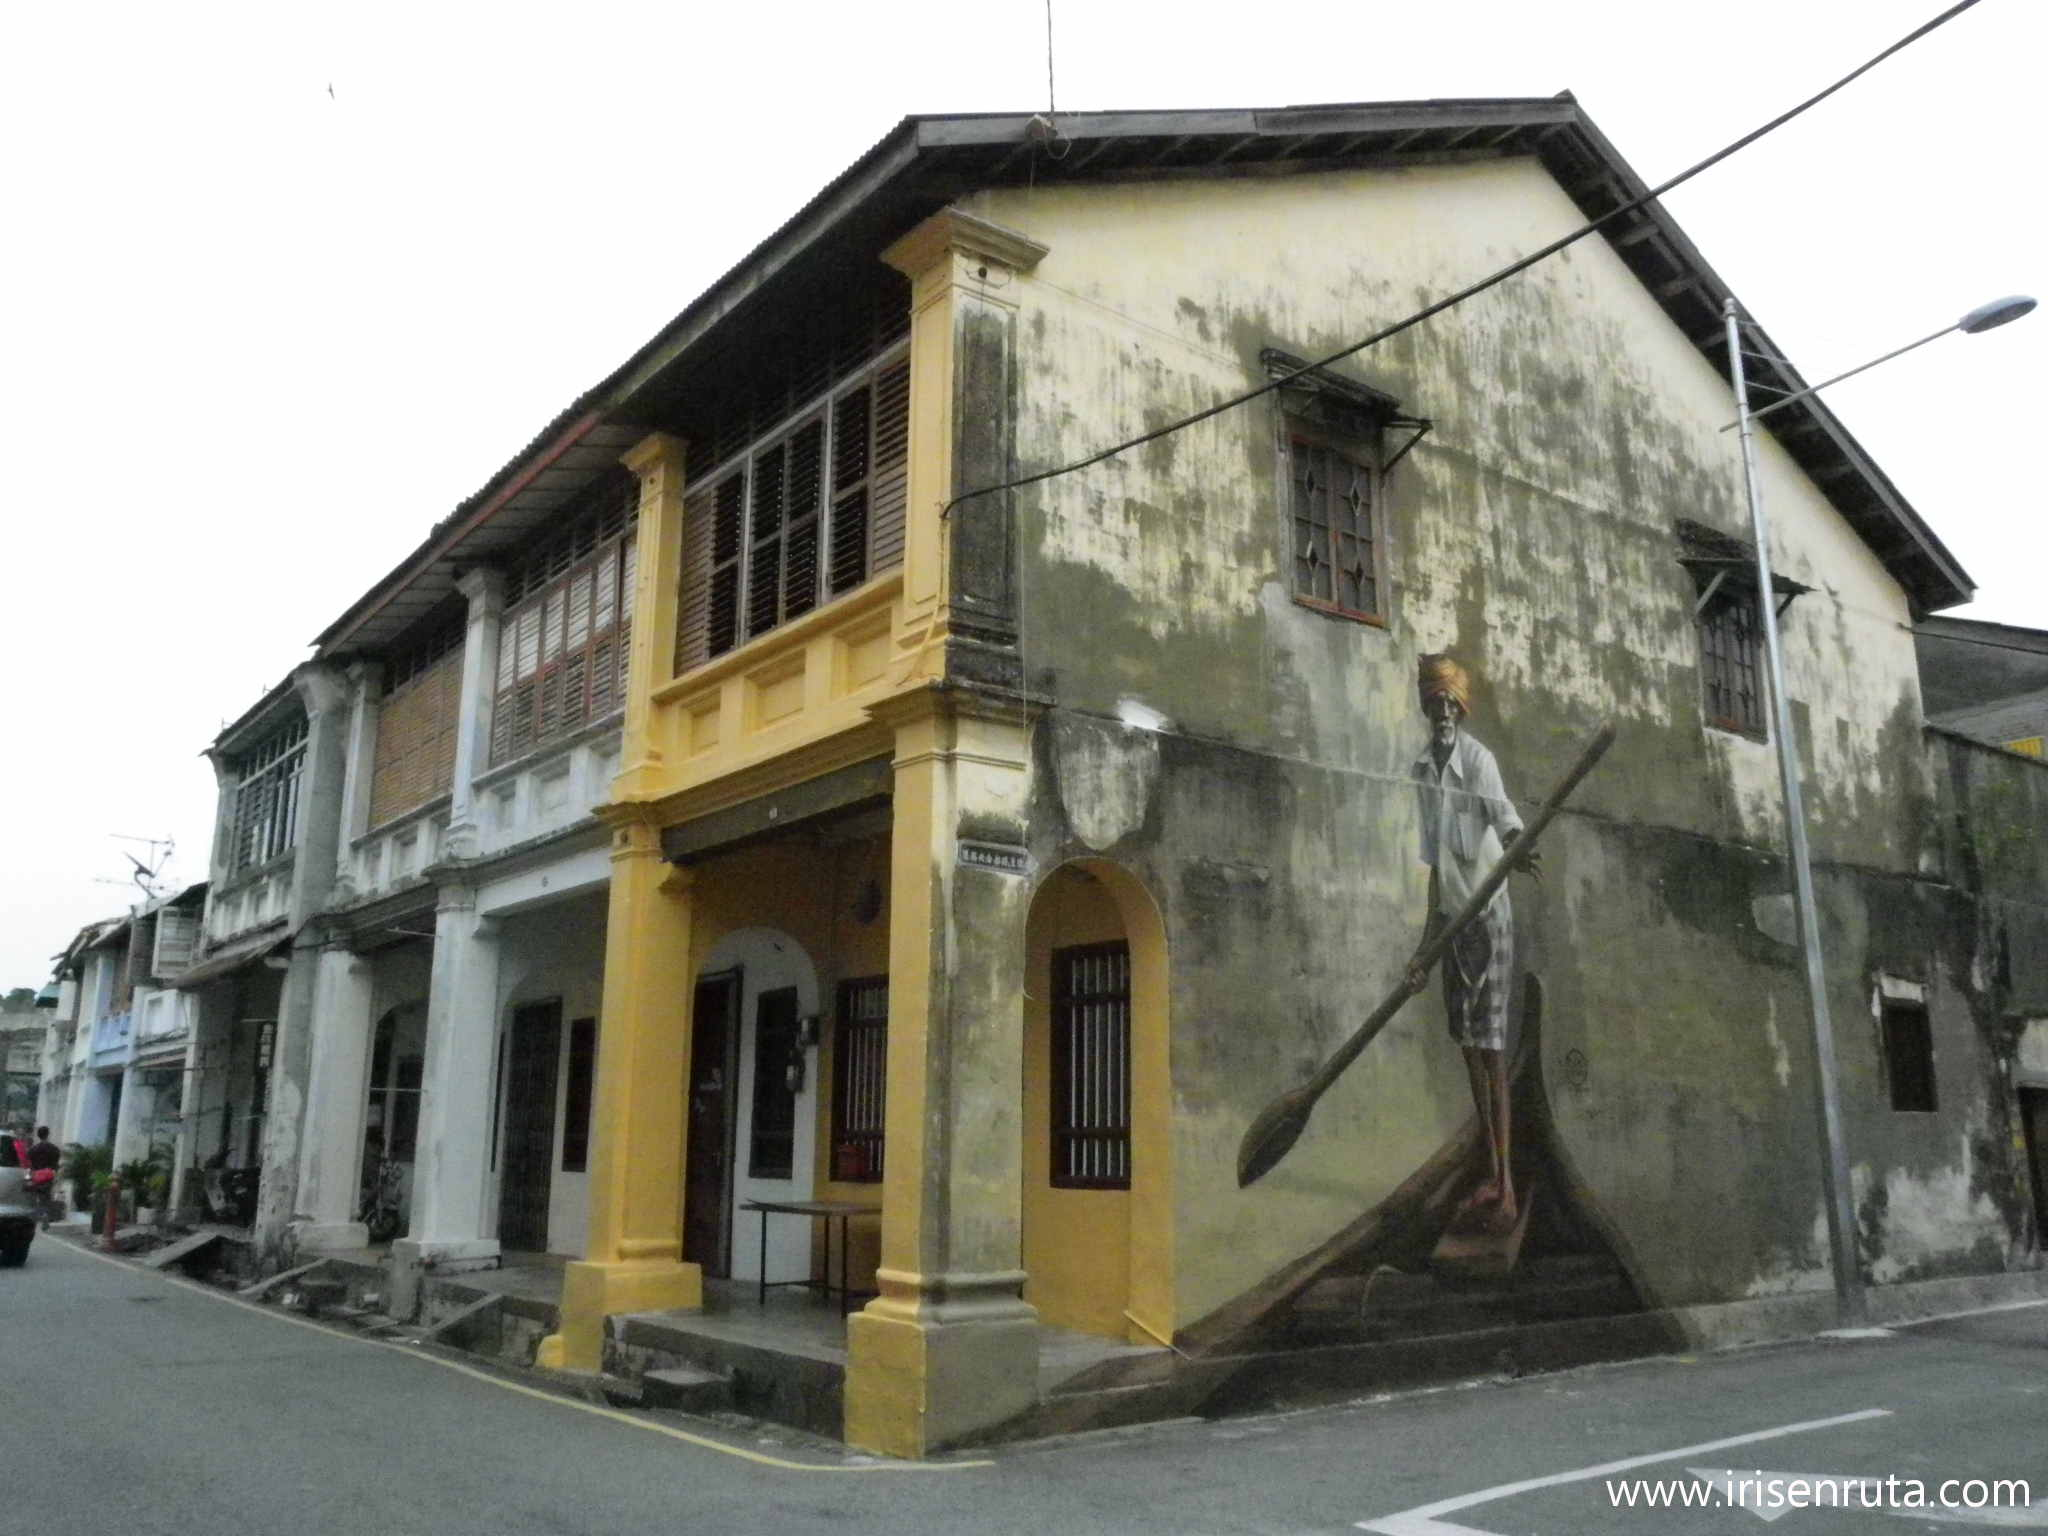 Clockwise Hostel, el lugar donde me hospedé